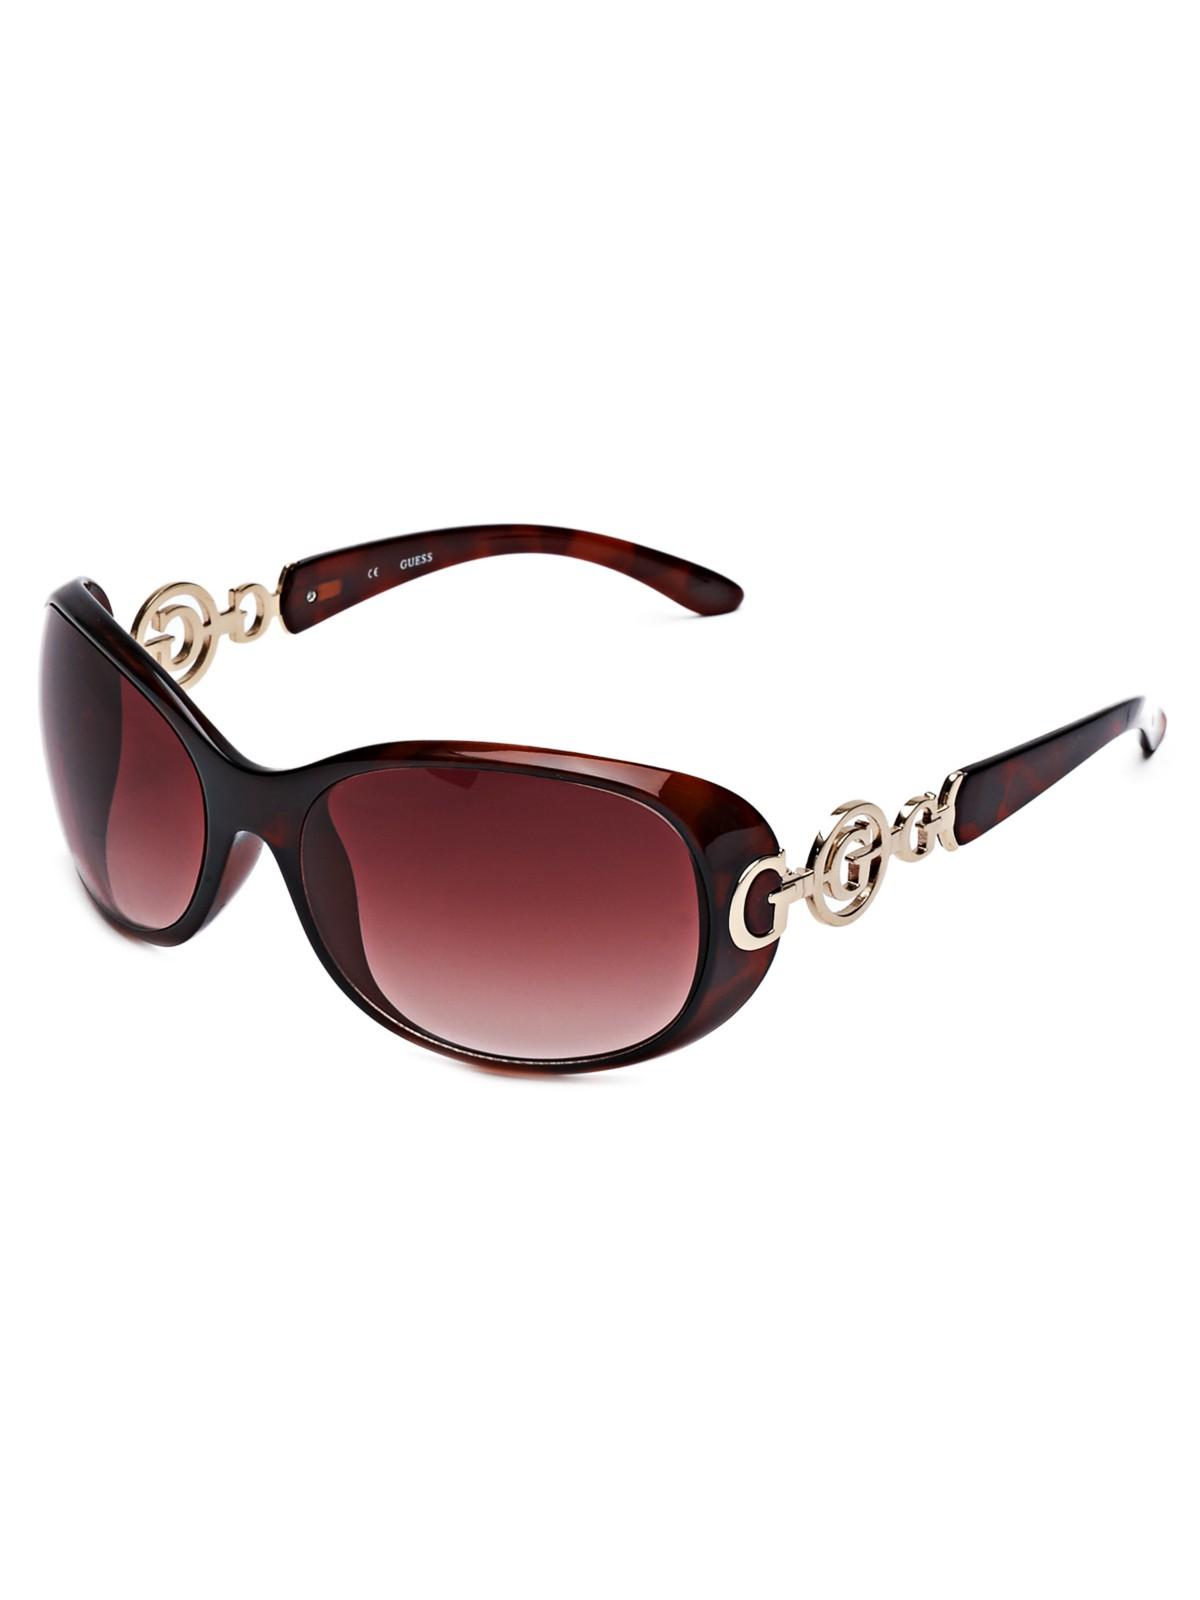 Guess Womens Sunglasses Gu 7055 David Simchi Levi